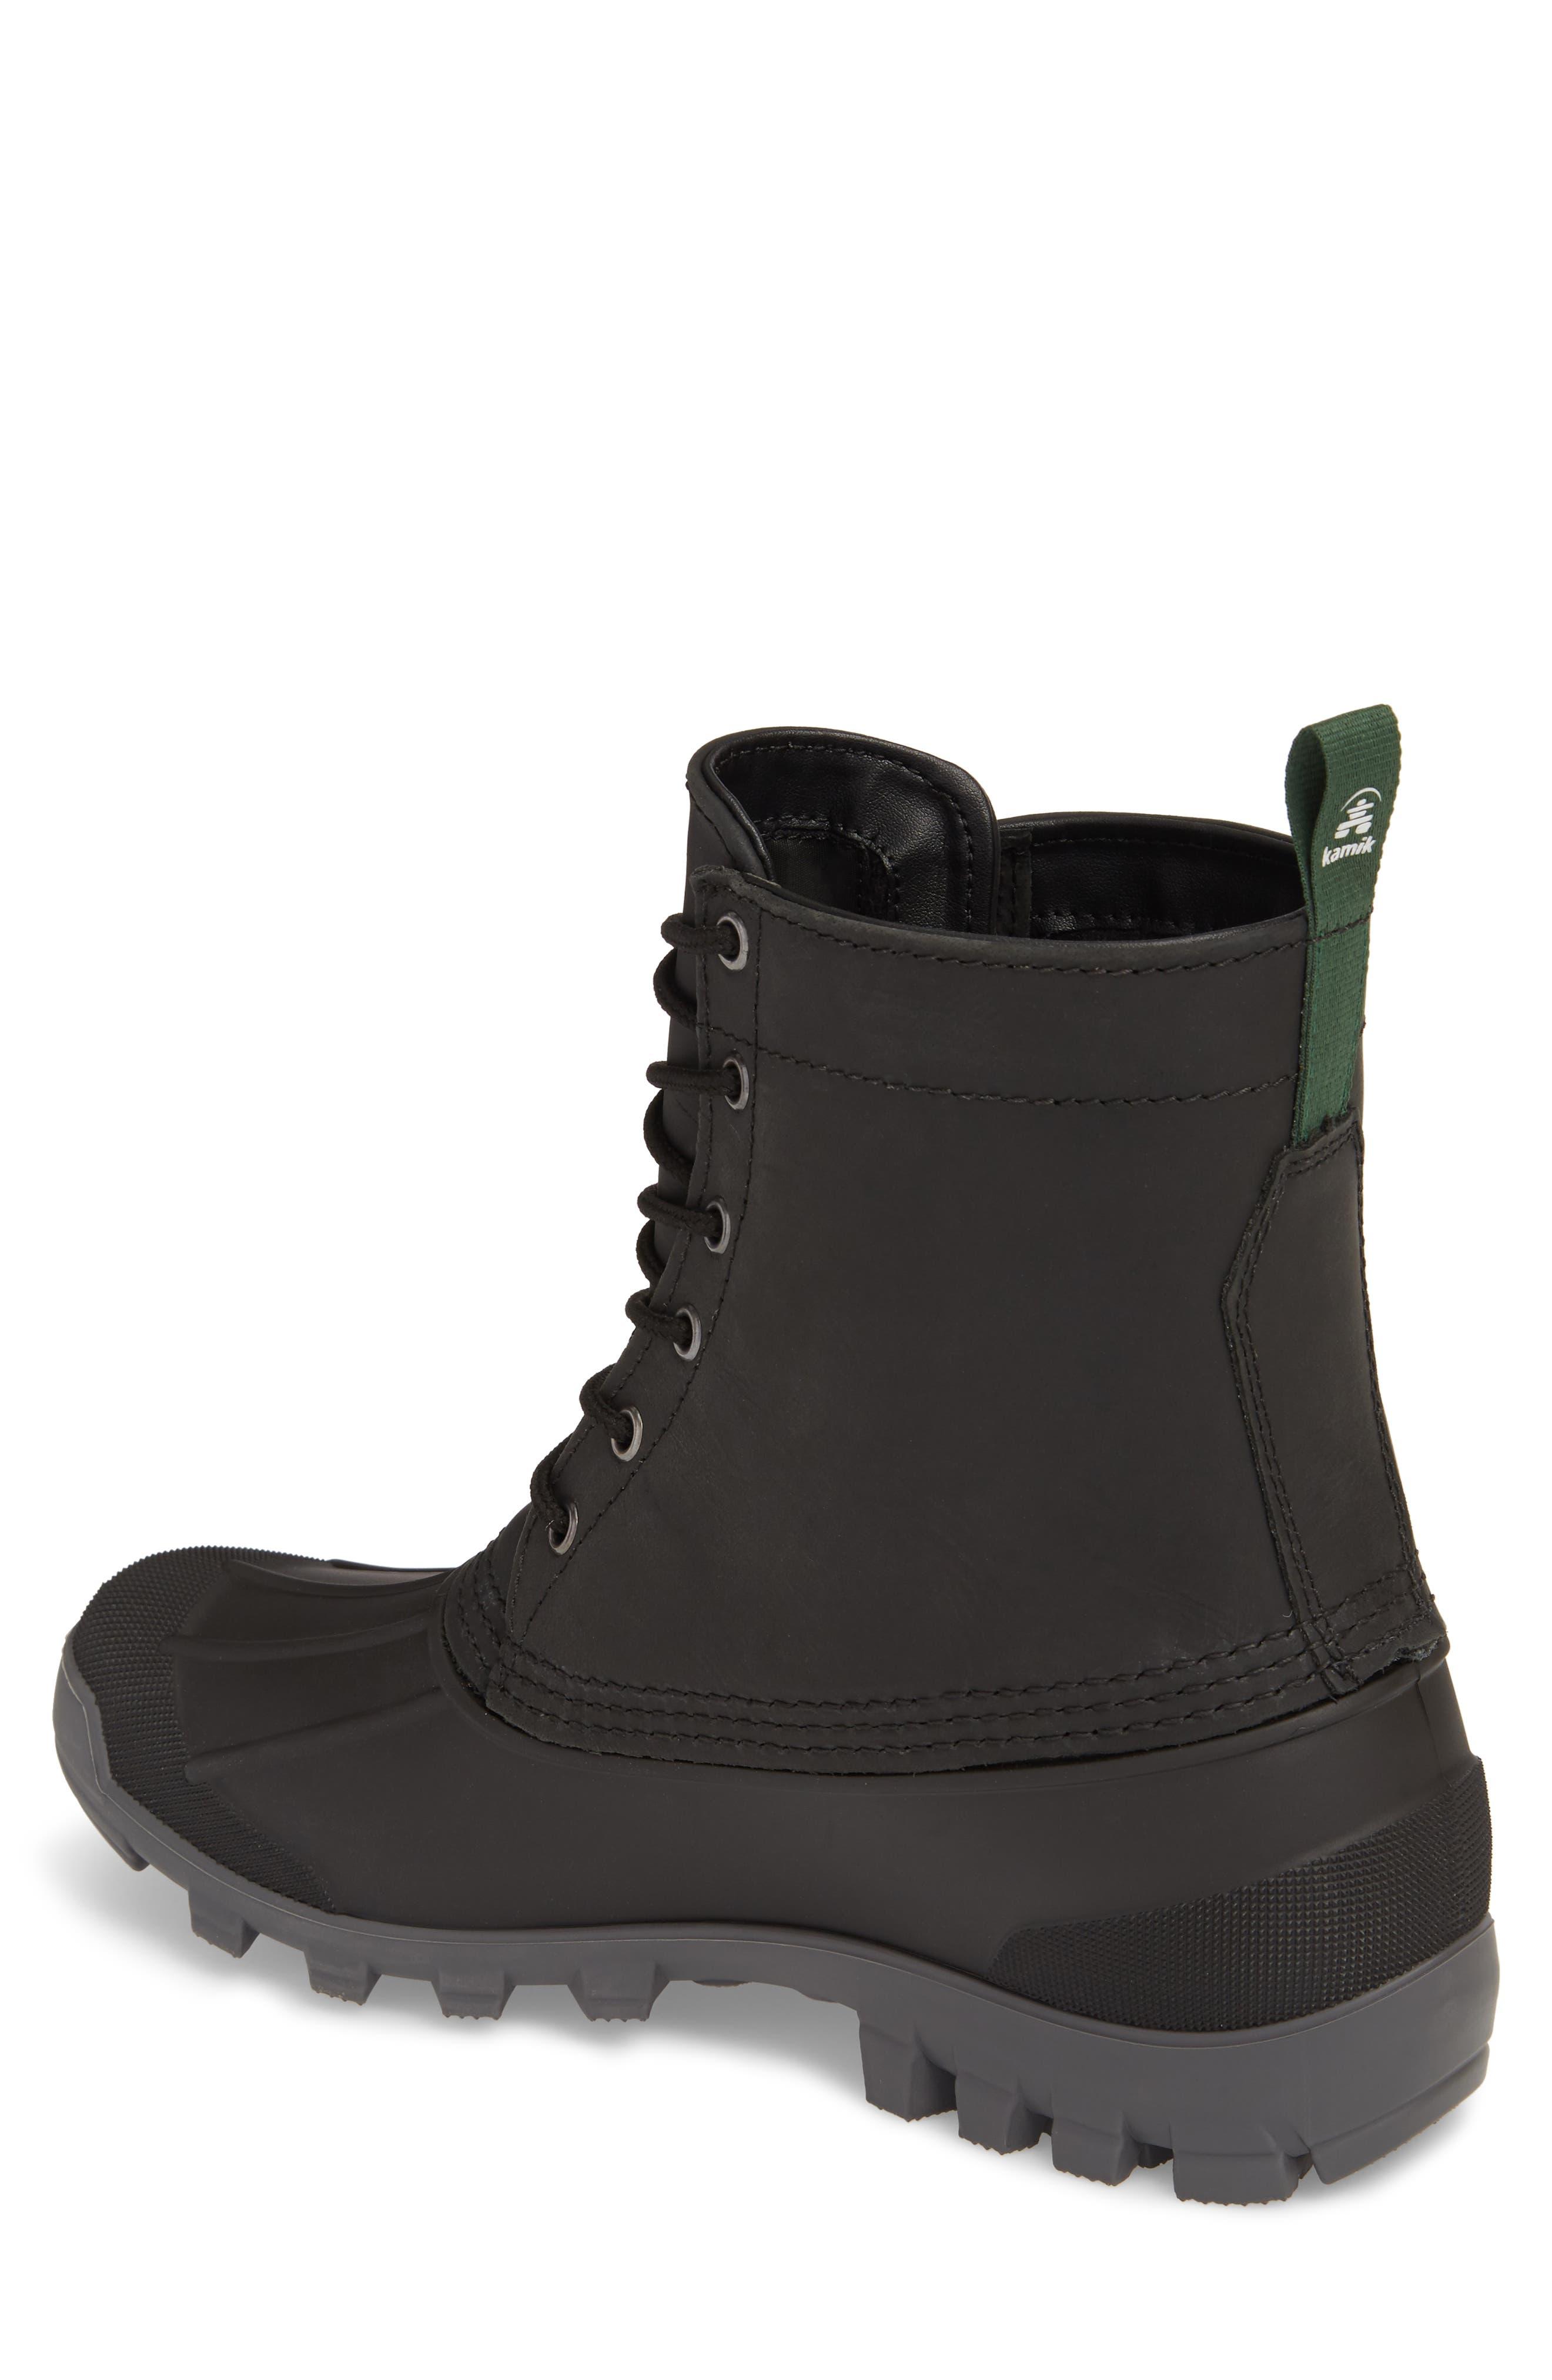 Yukon 6 Waterproof Insulated Three-Season Boot,                             Alternate thumbnail 2, color,                             001